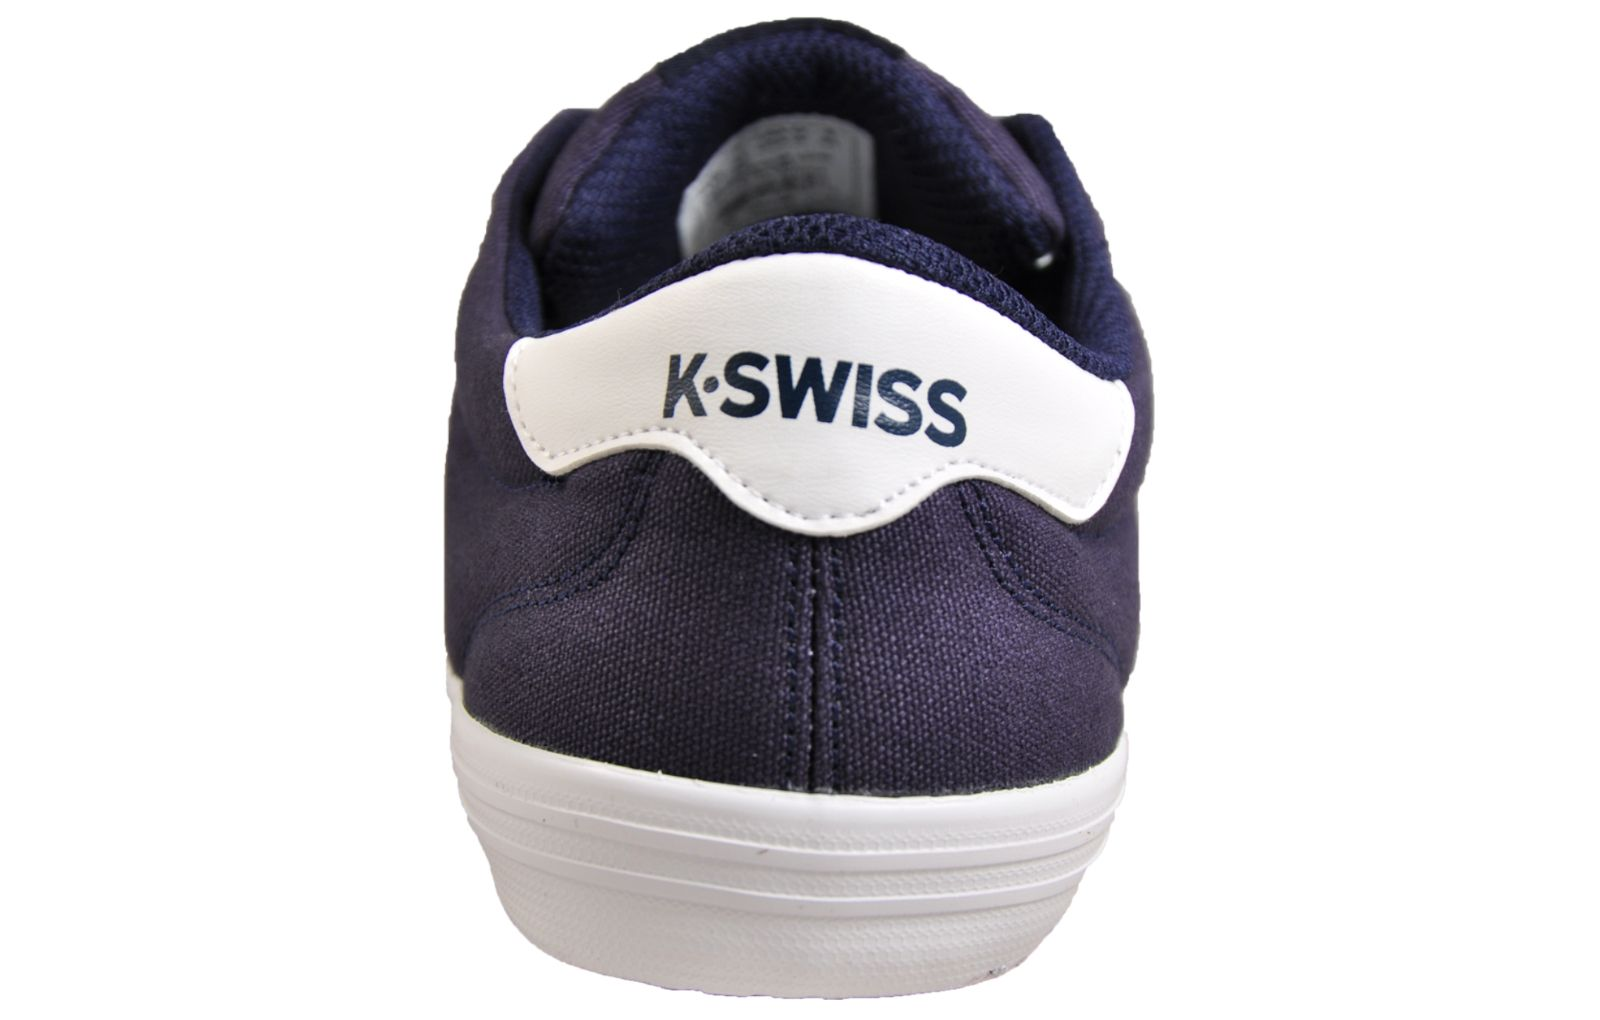 K Swiss Backspin Mens